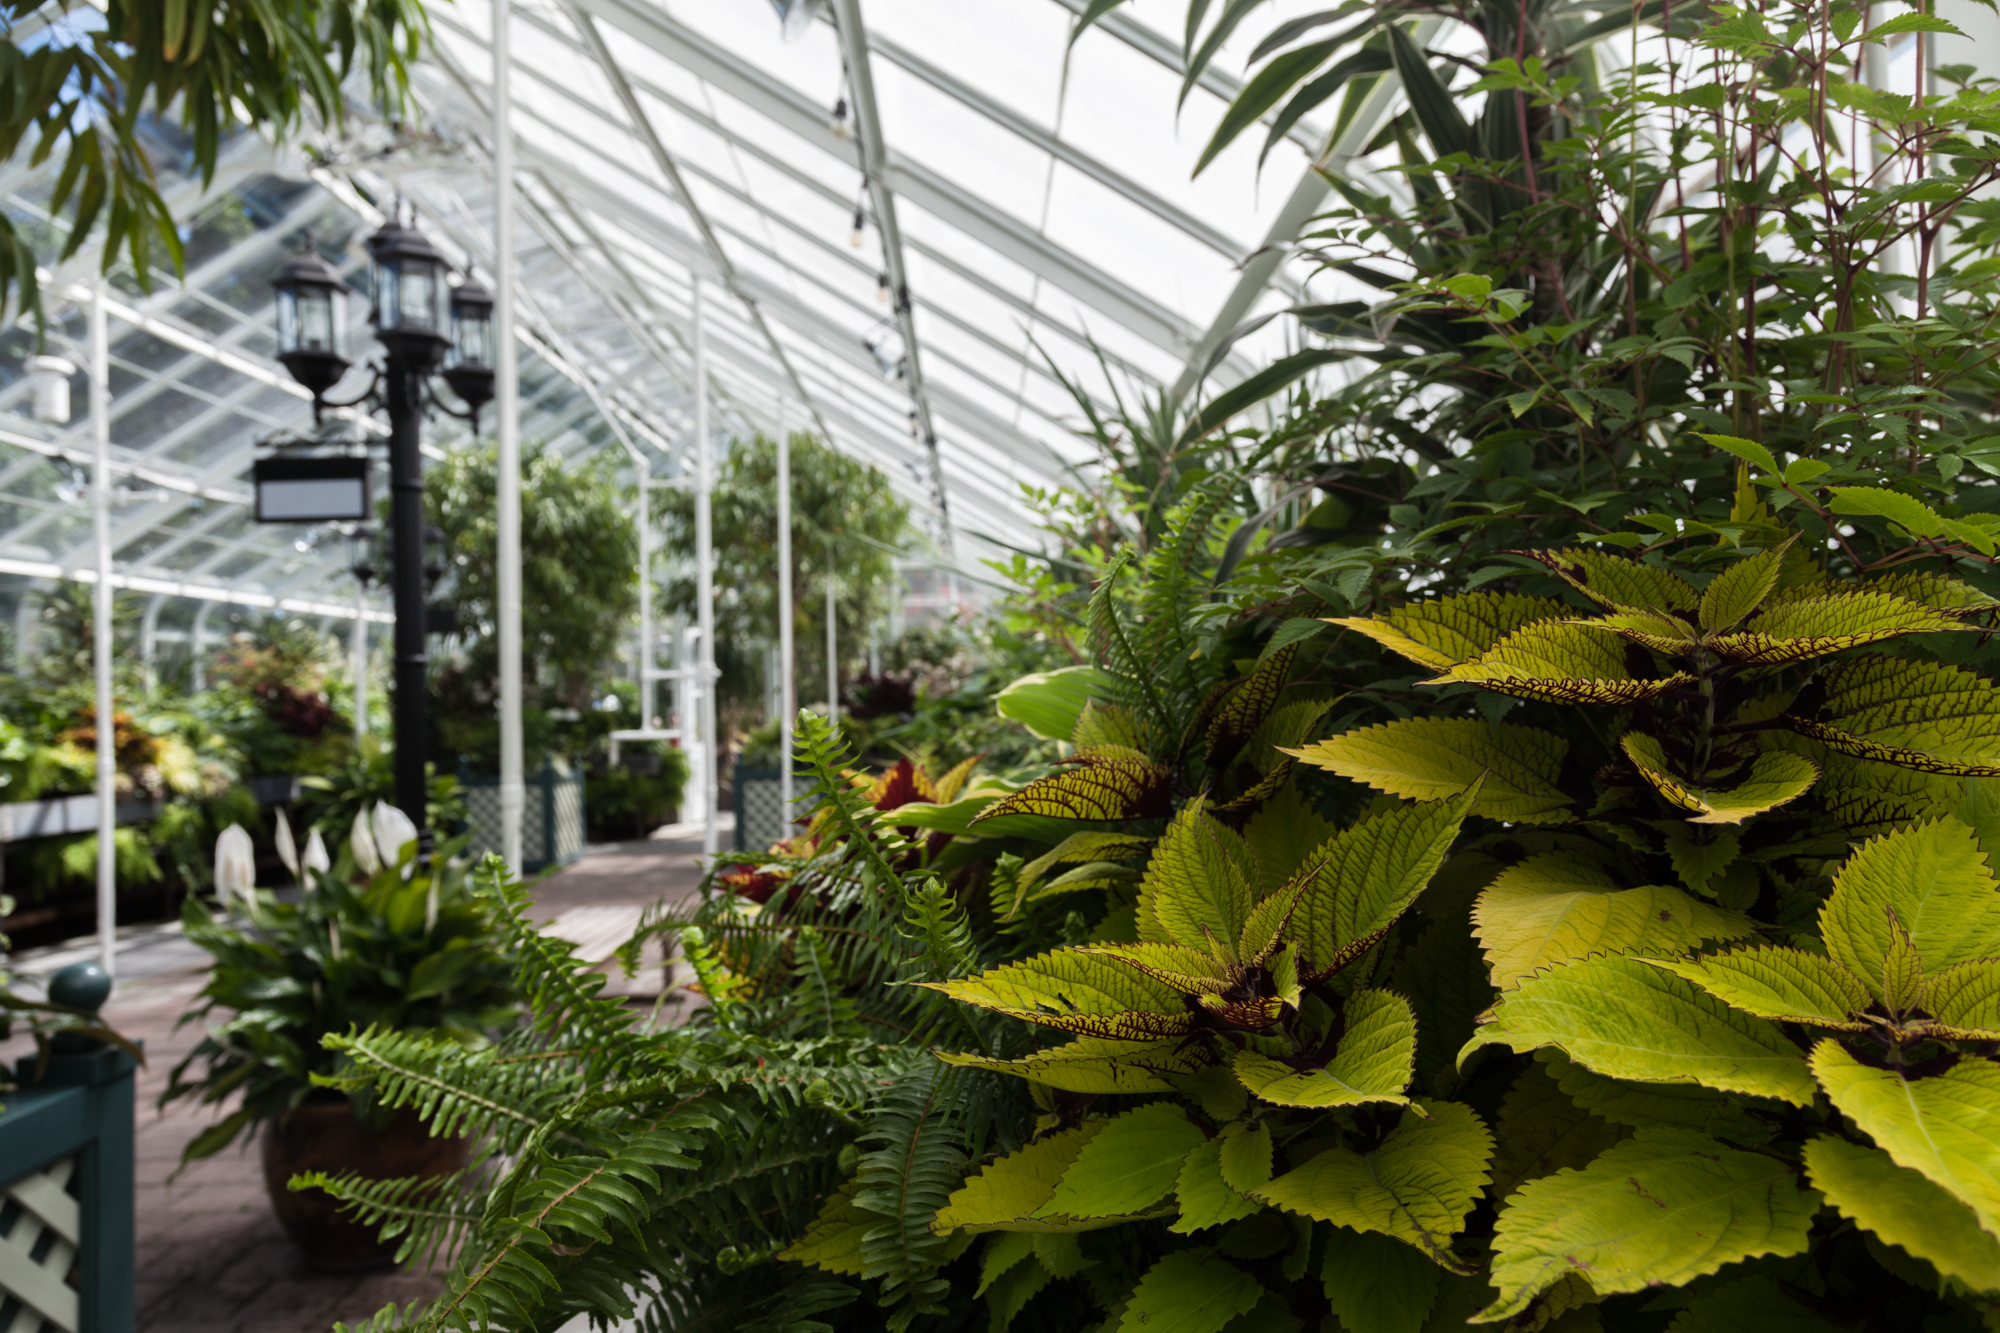 Coleus-Volunteer-Park-Conservatory.jpg